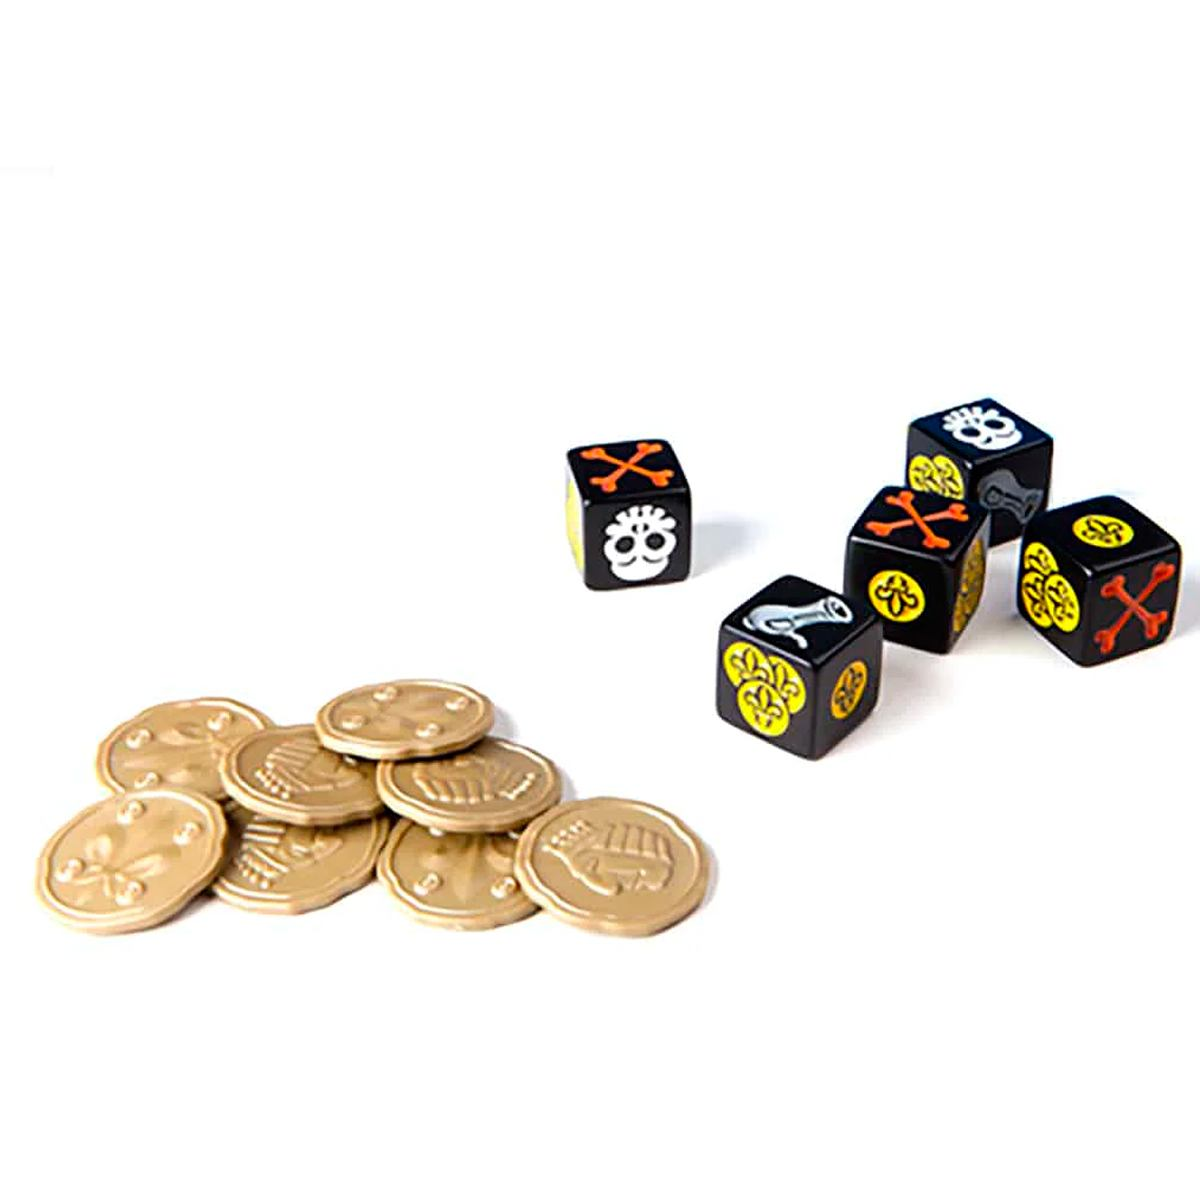 Kings Gold Jogo de Dados